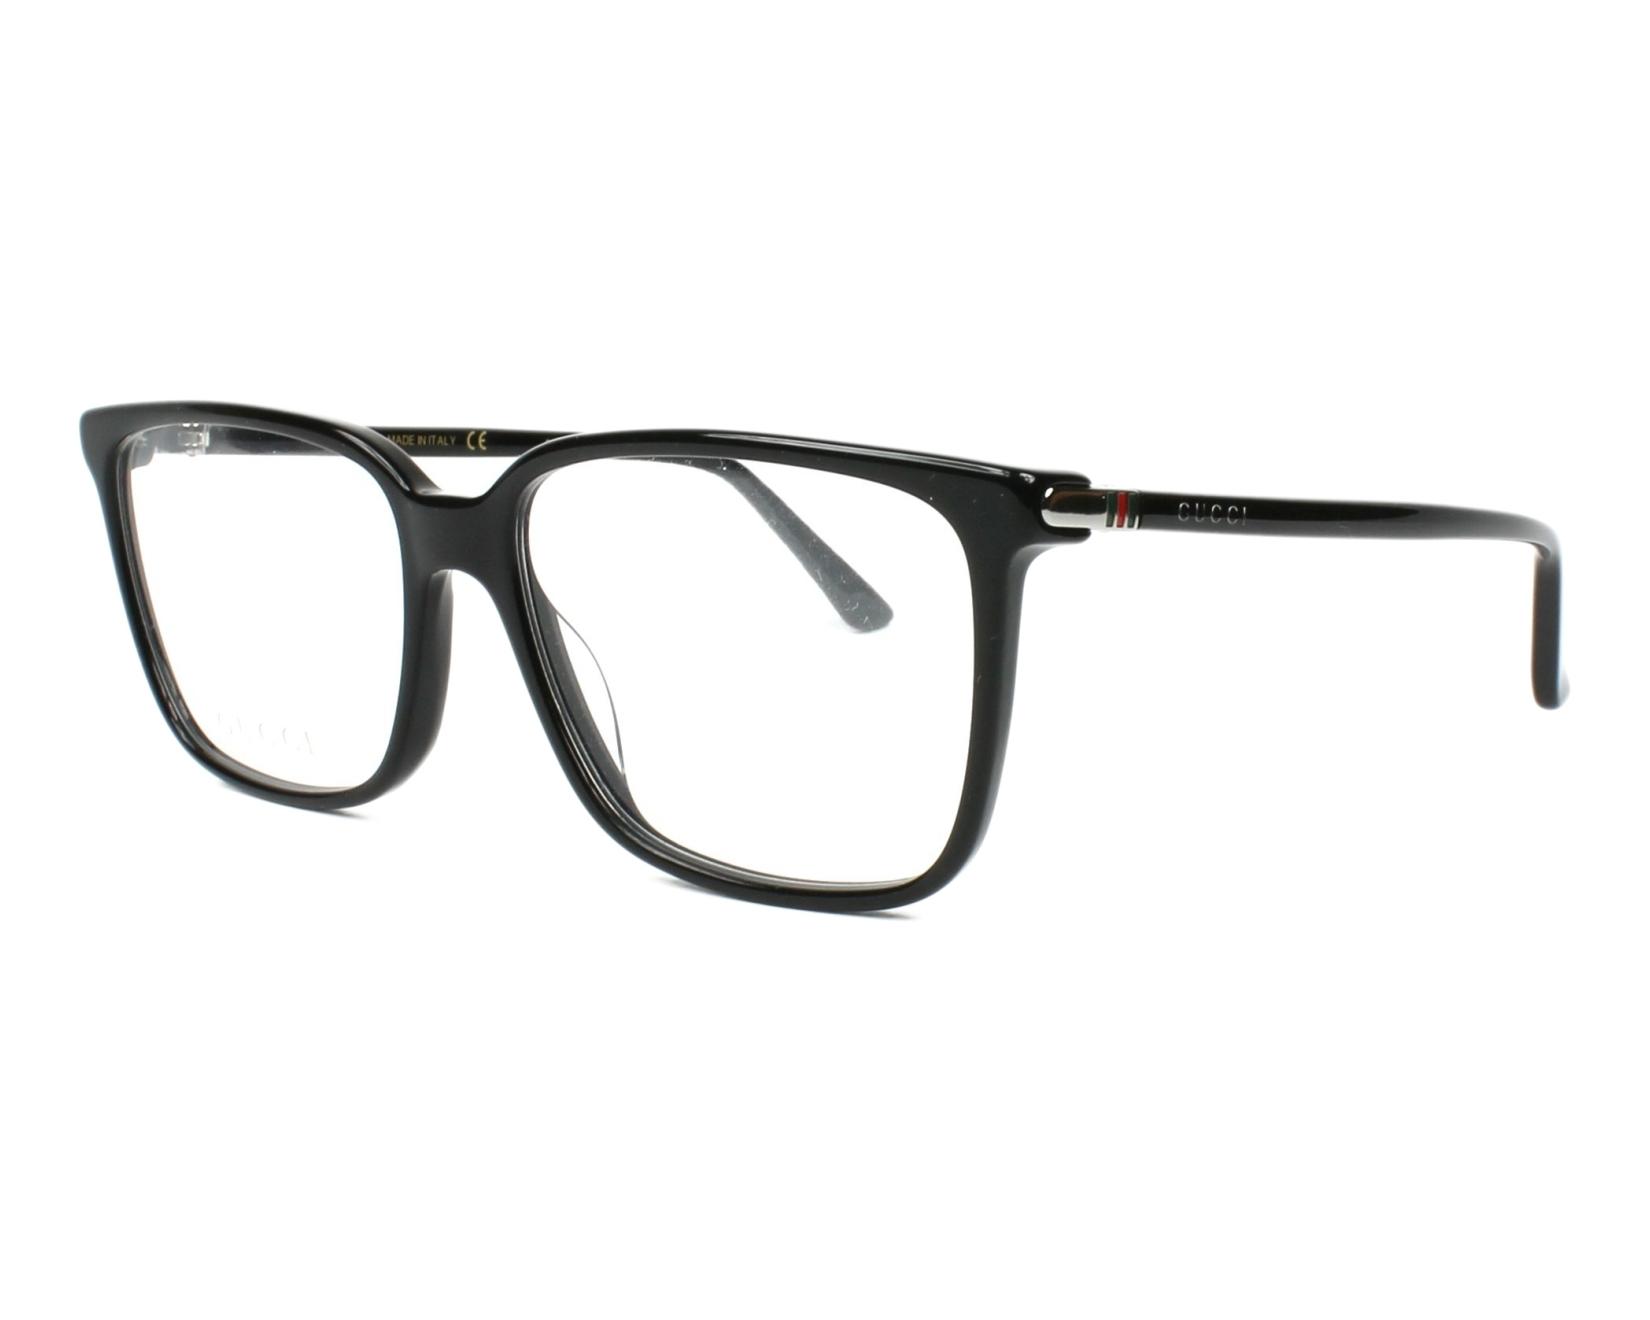 51997730c21 eyeglasses Gucci GG-00190 001 56-16 Black profile view